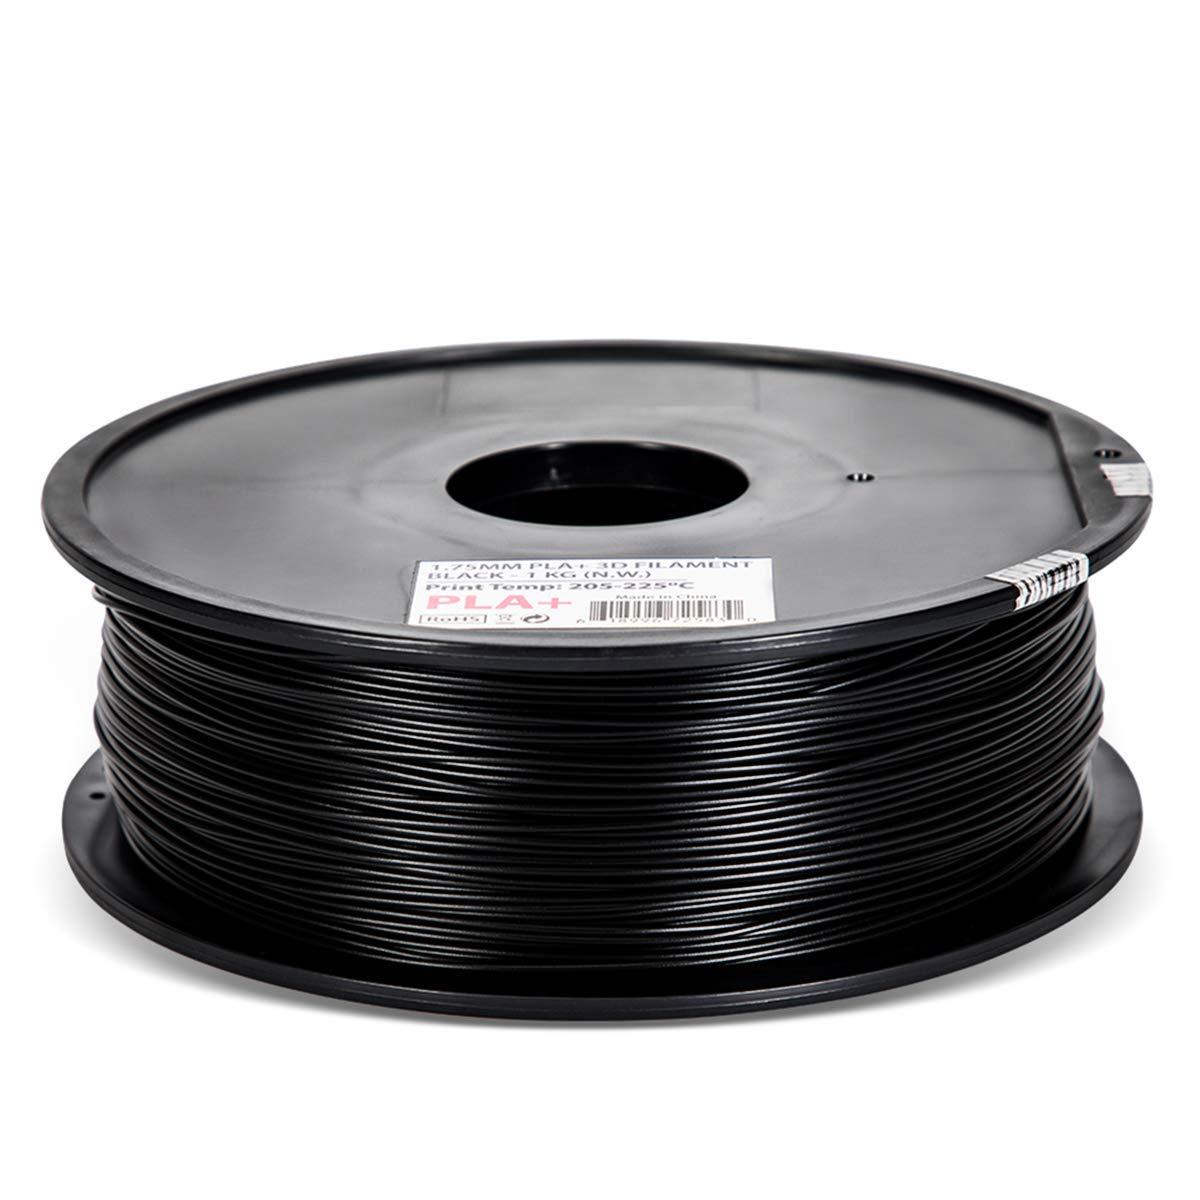 Inland 1.75mm Black PLA PRO 25% OFF PLA+ Spool 1KG 3D Limited price Filament Printer